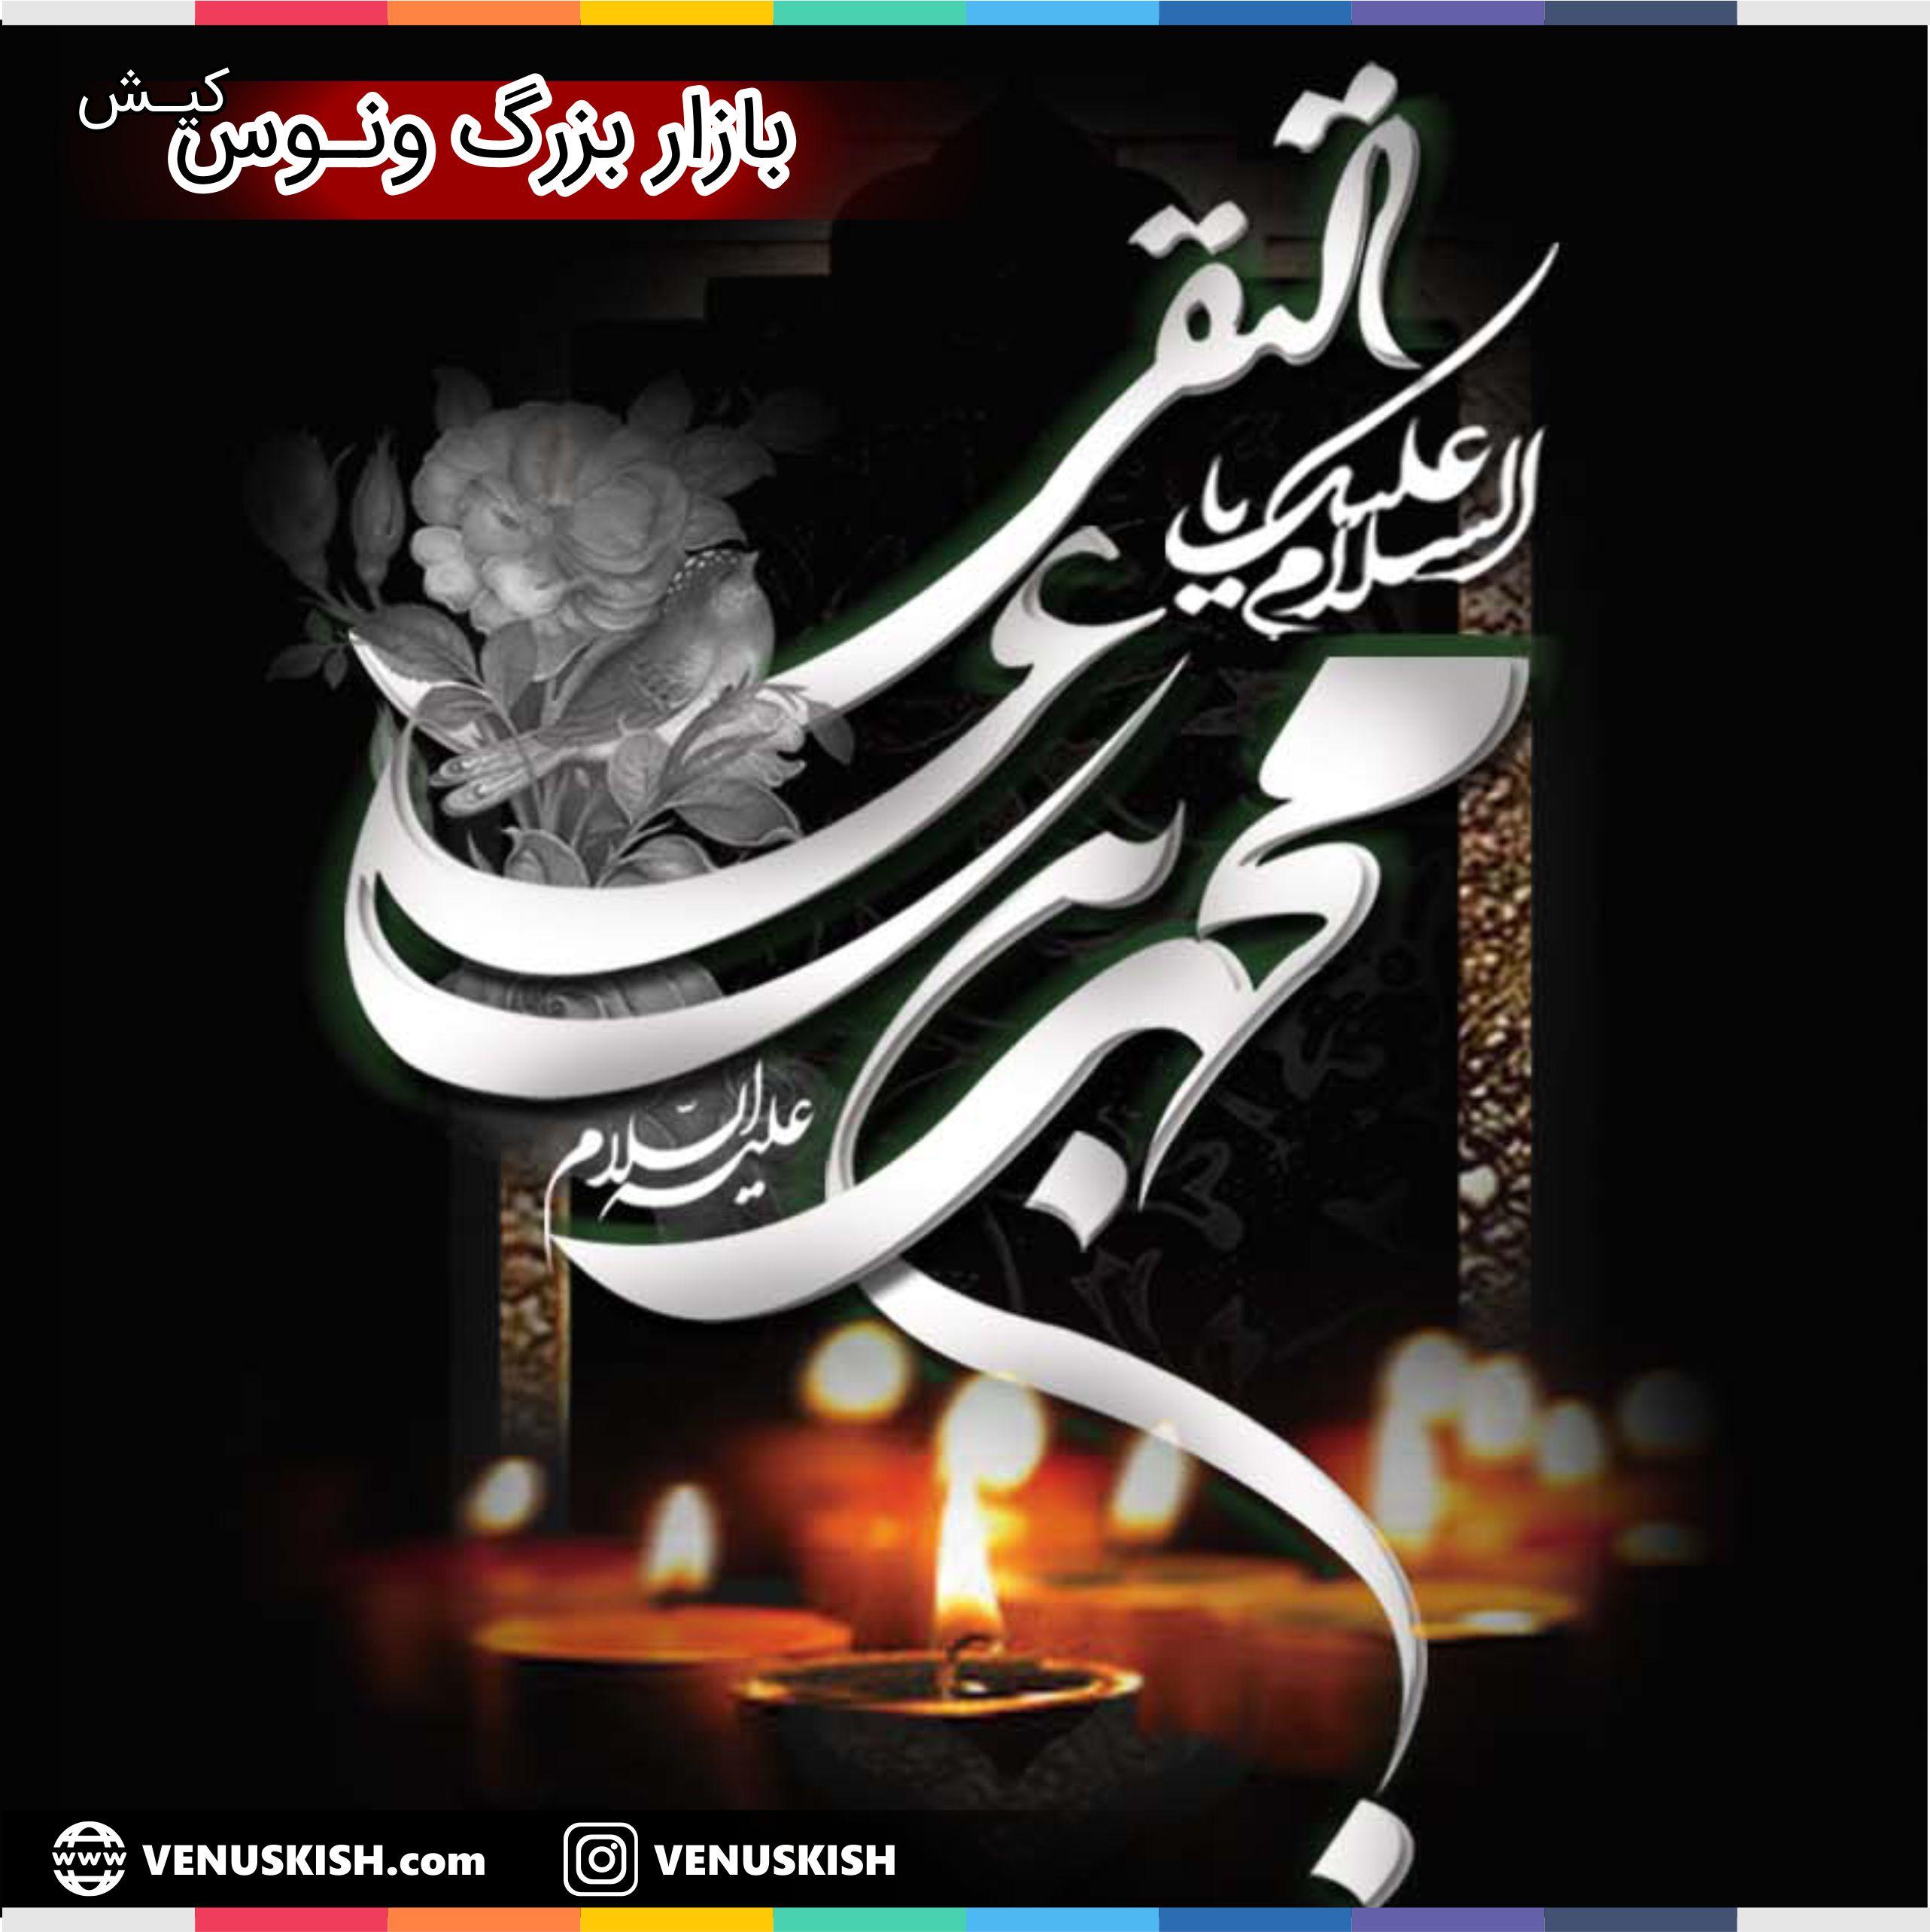 ⚫️سالروز شهادت امام محمد تقی (جواد الائمه) علیه السلام تسلیت باد⚫️